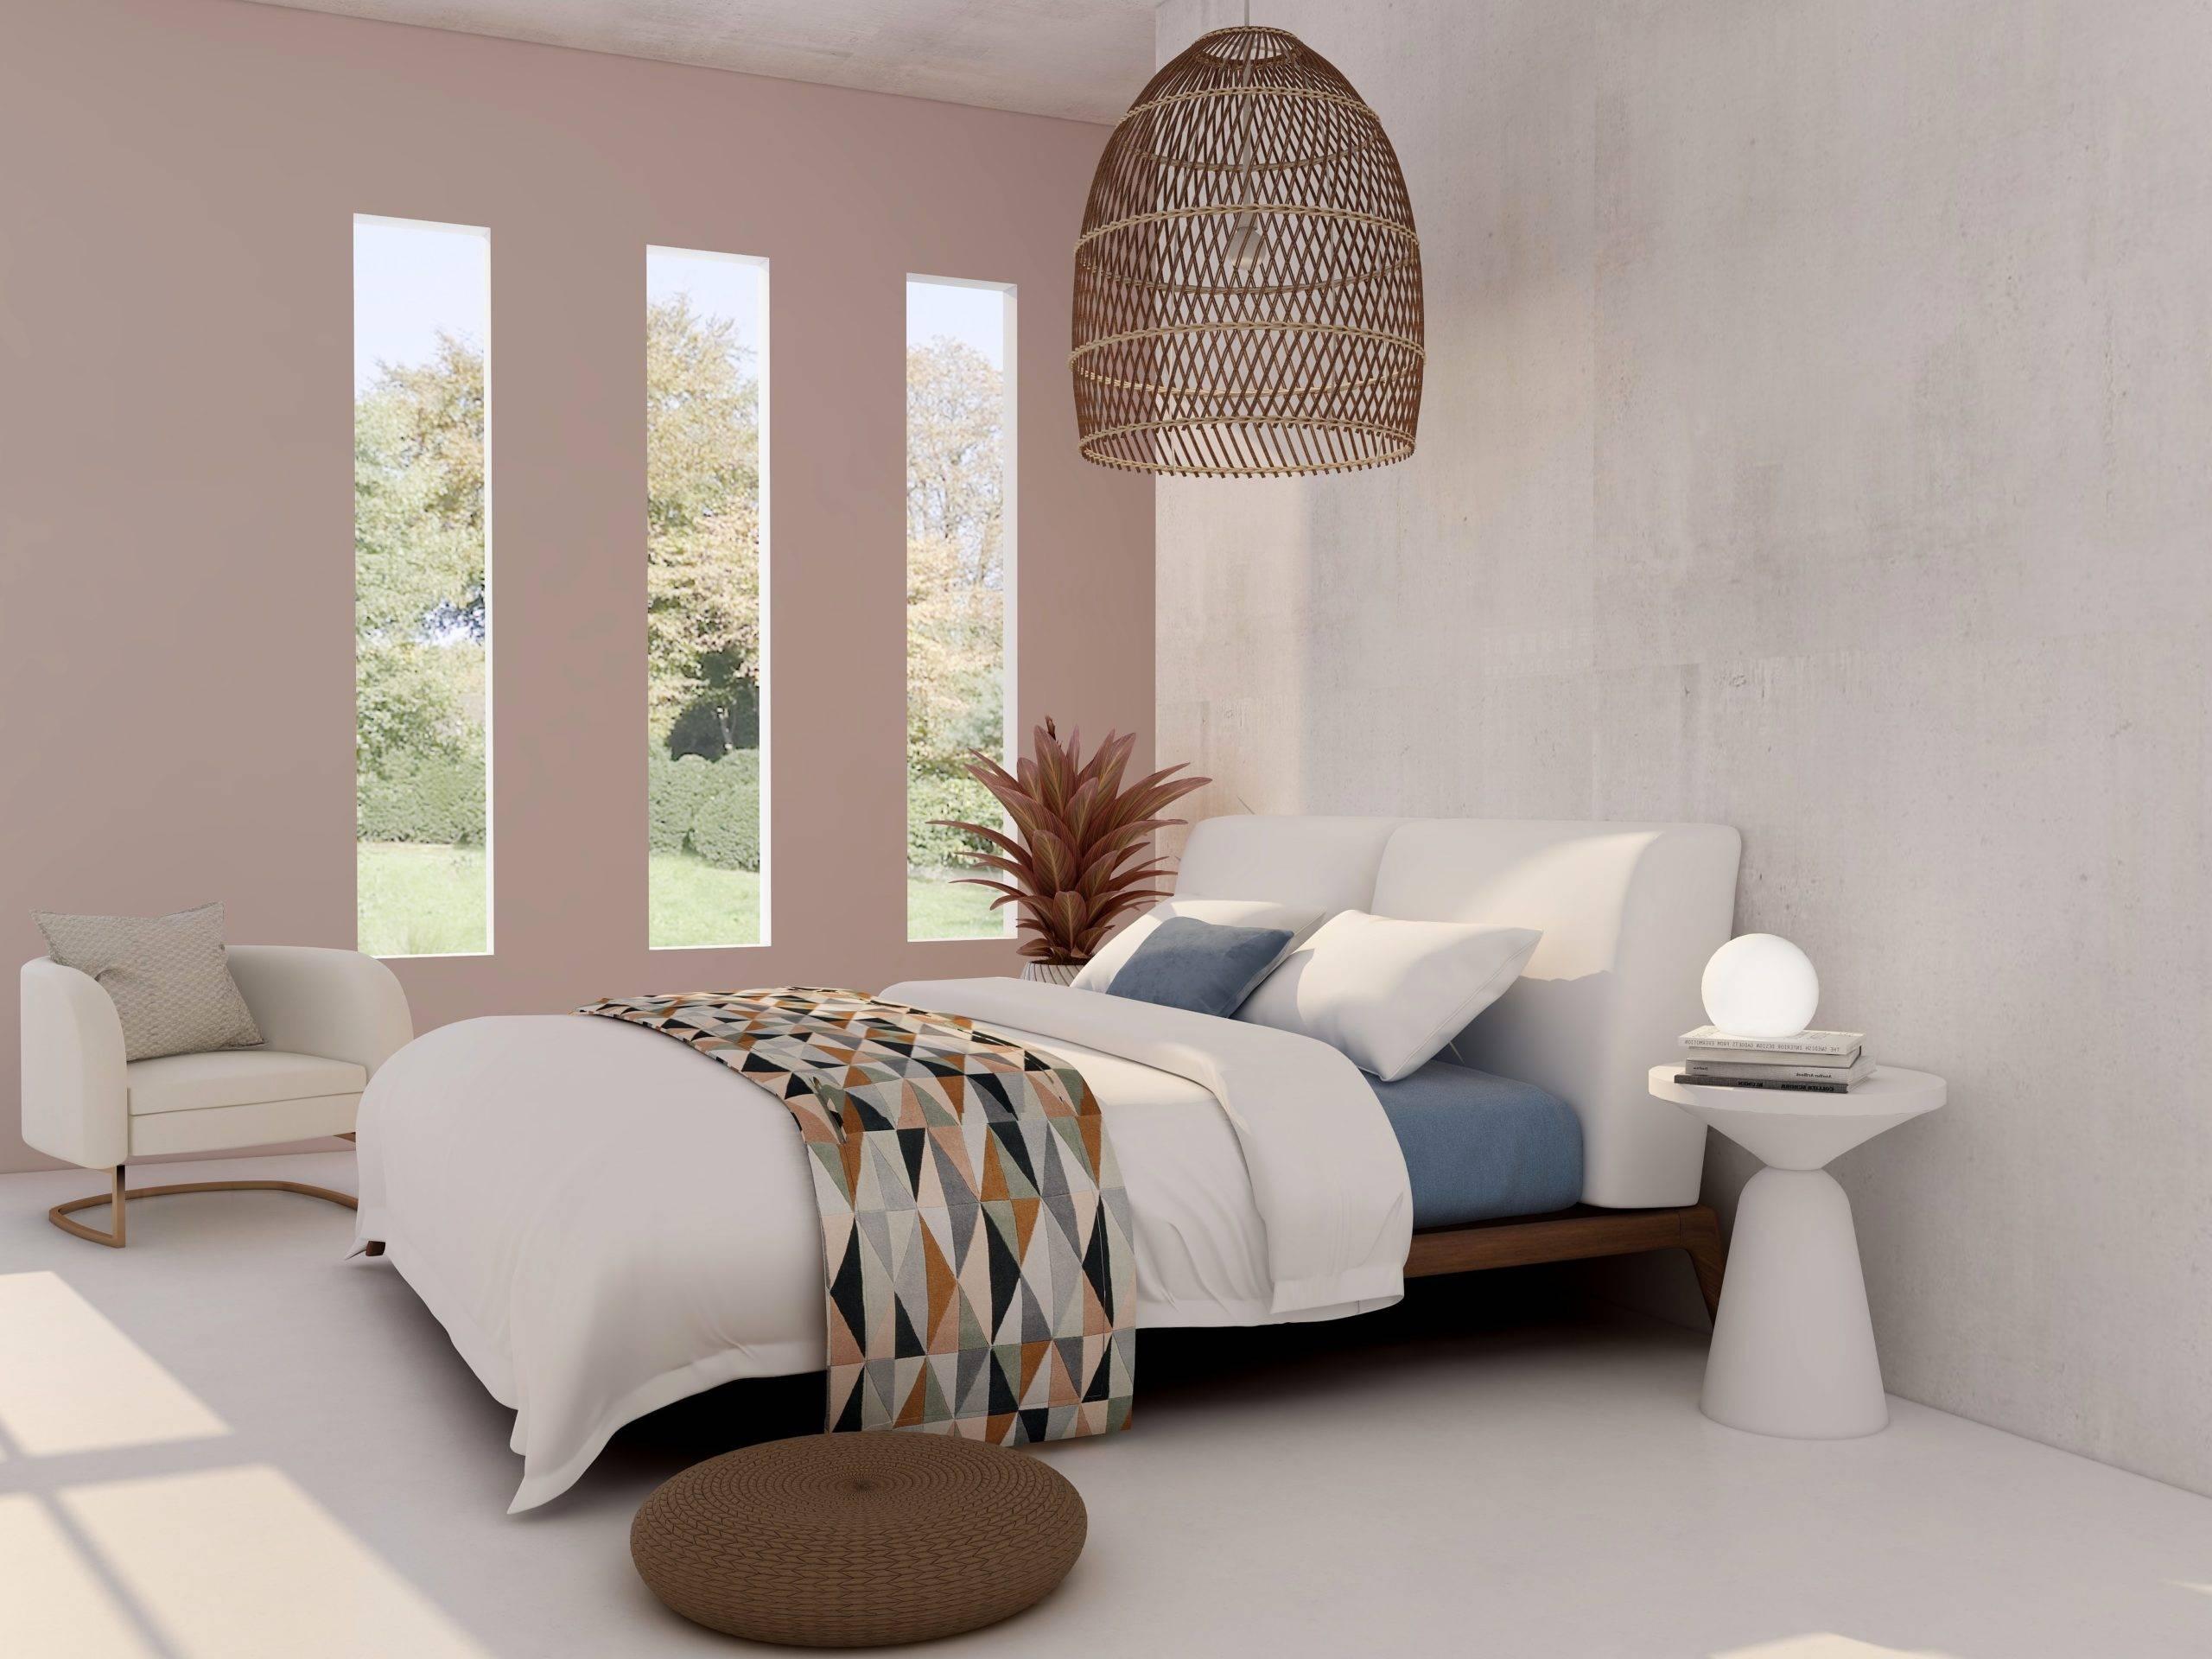 Minimalist bedroom with three vertical square windows